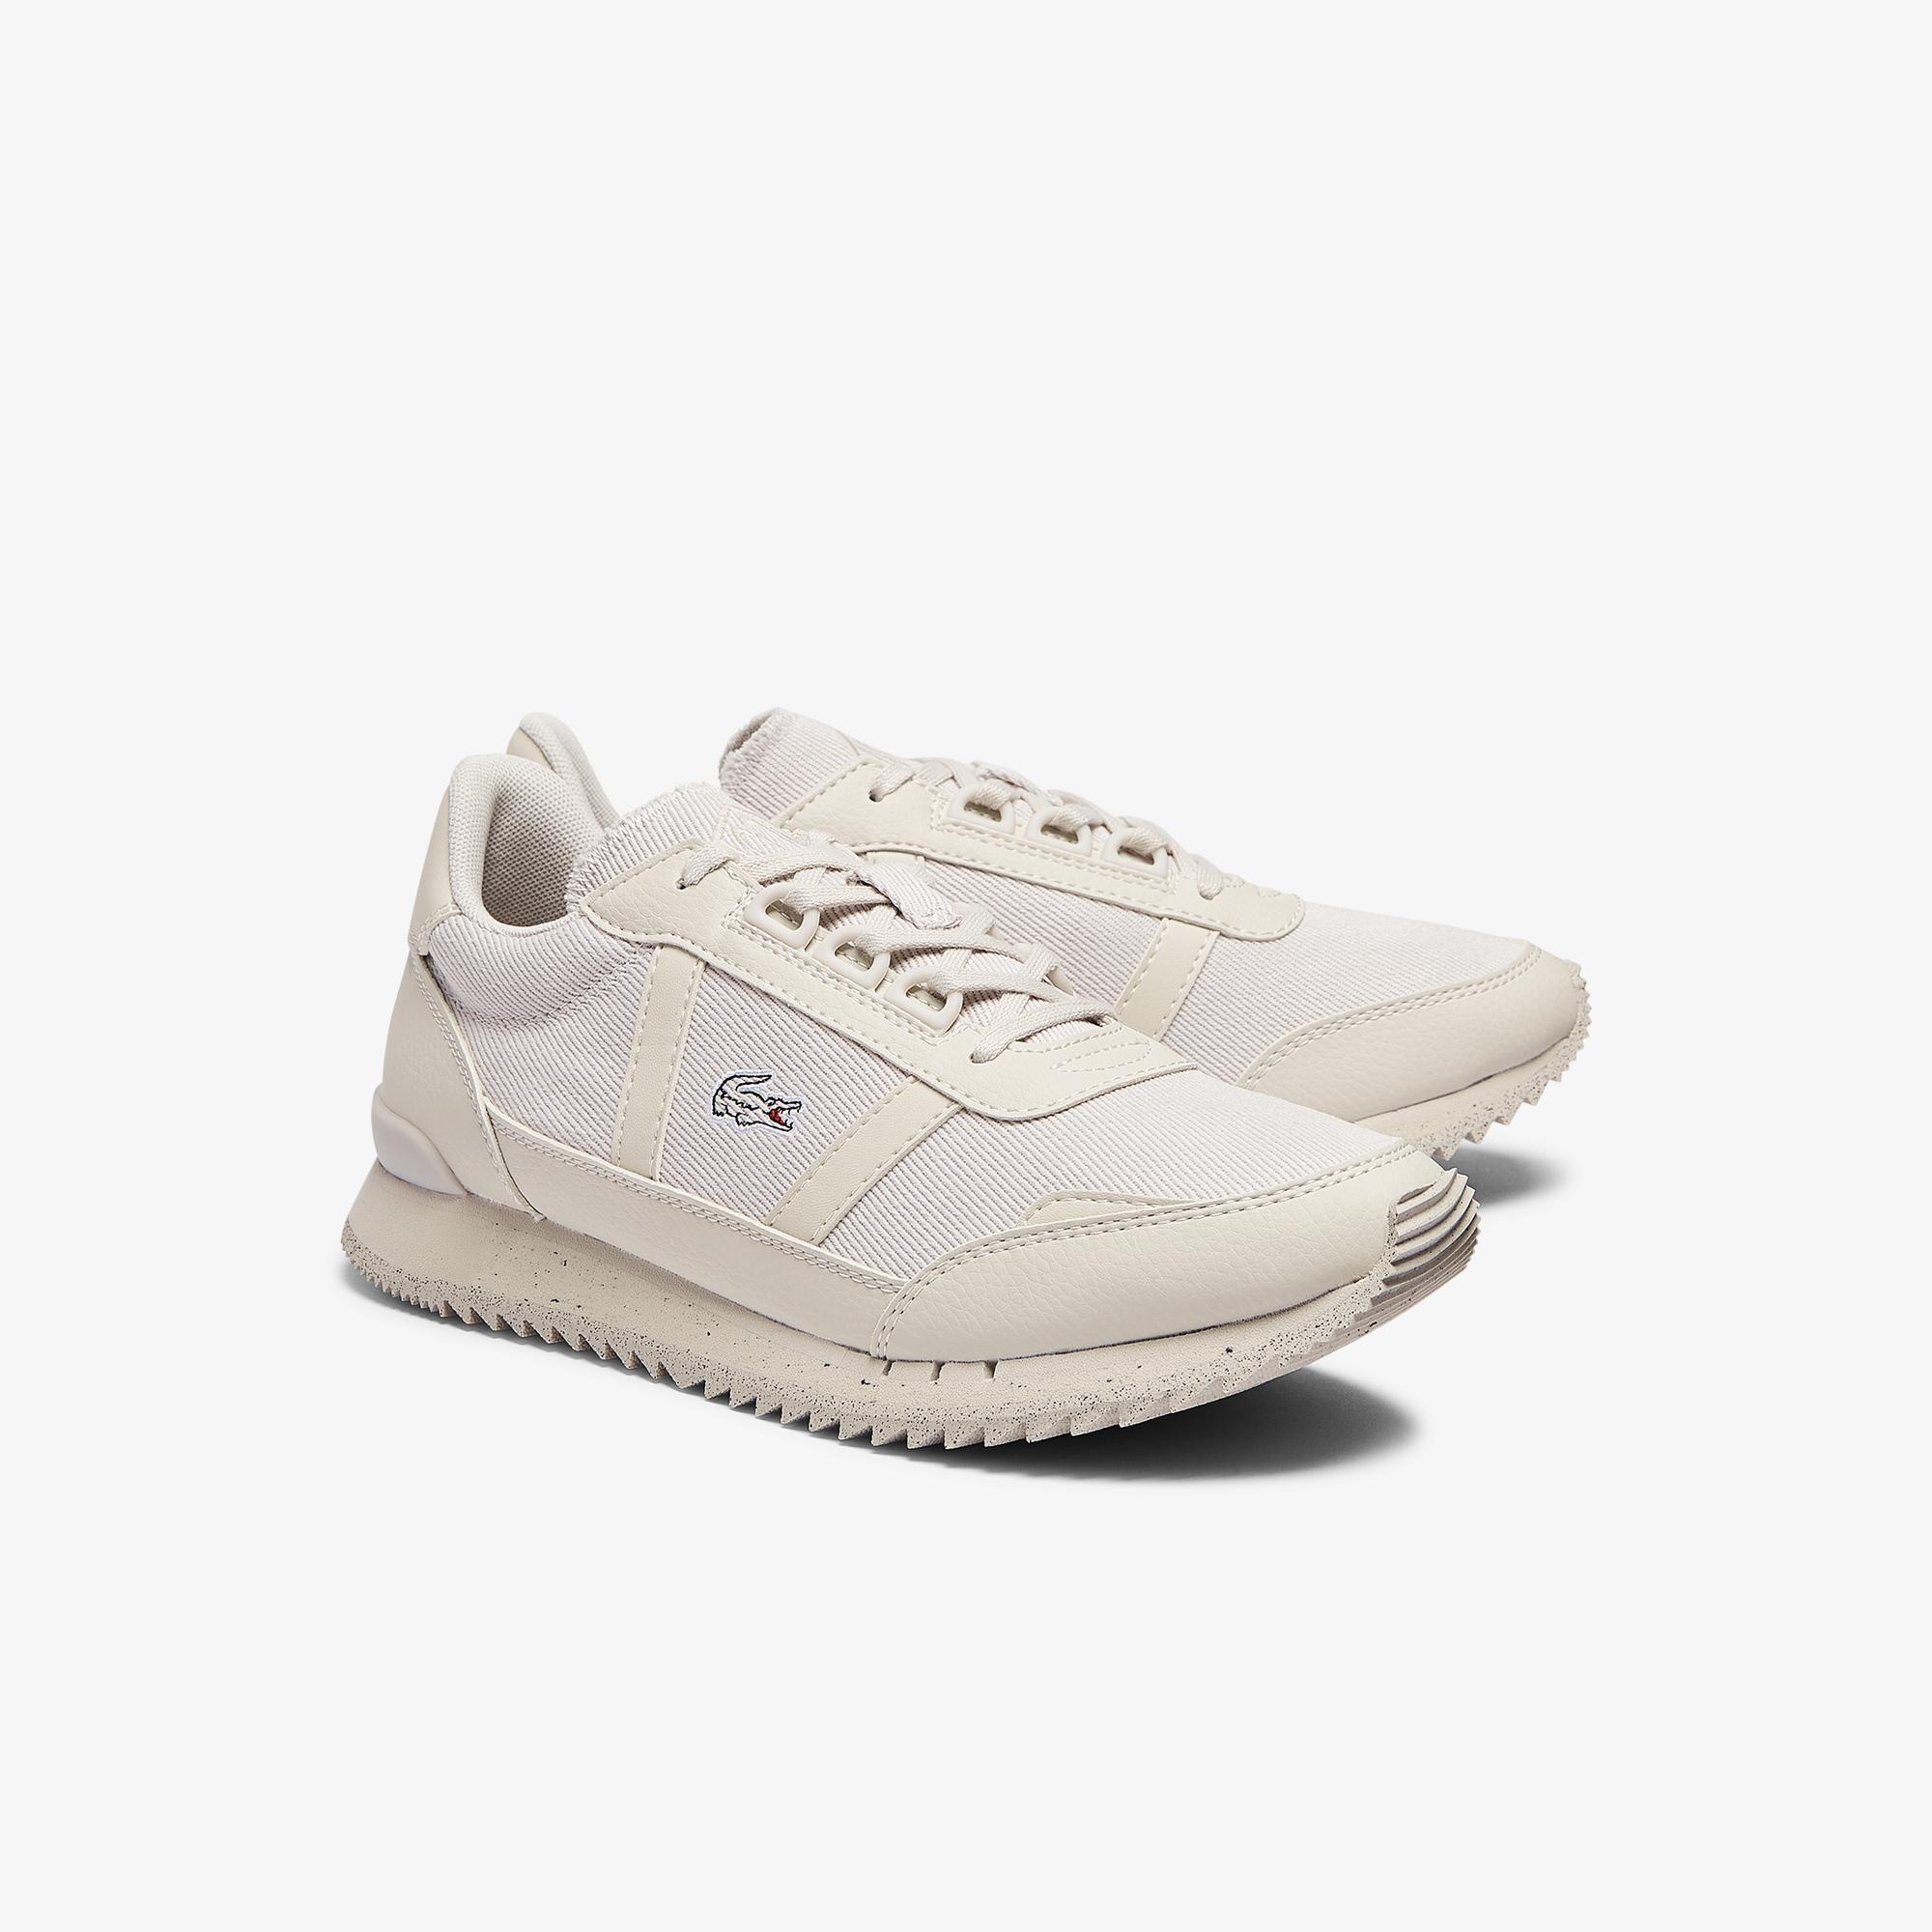 Lacoste Partner Retro 0921 1 Sfa Kadın Bej Sneaker